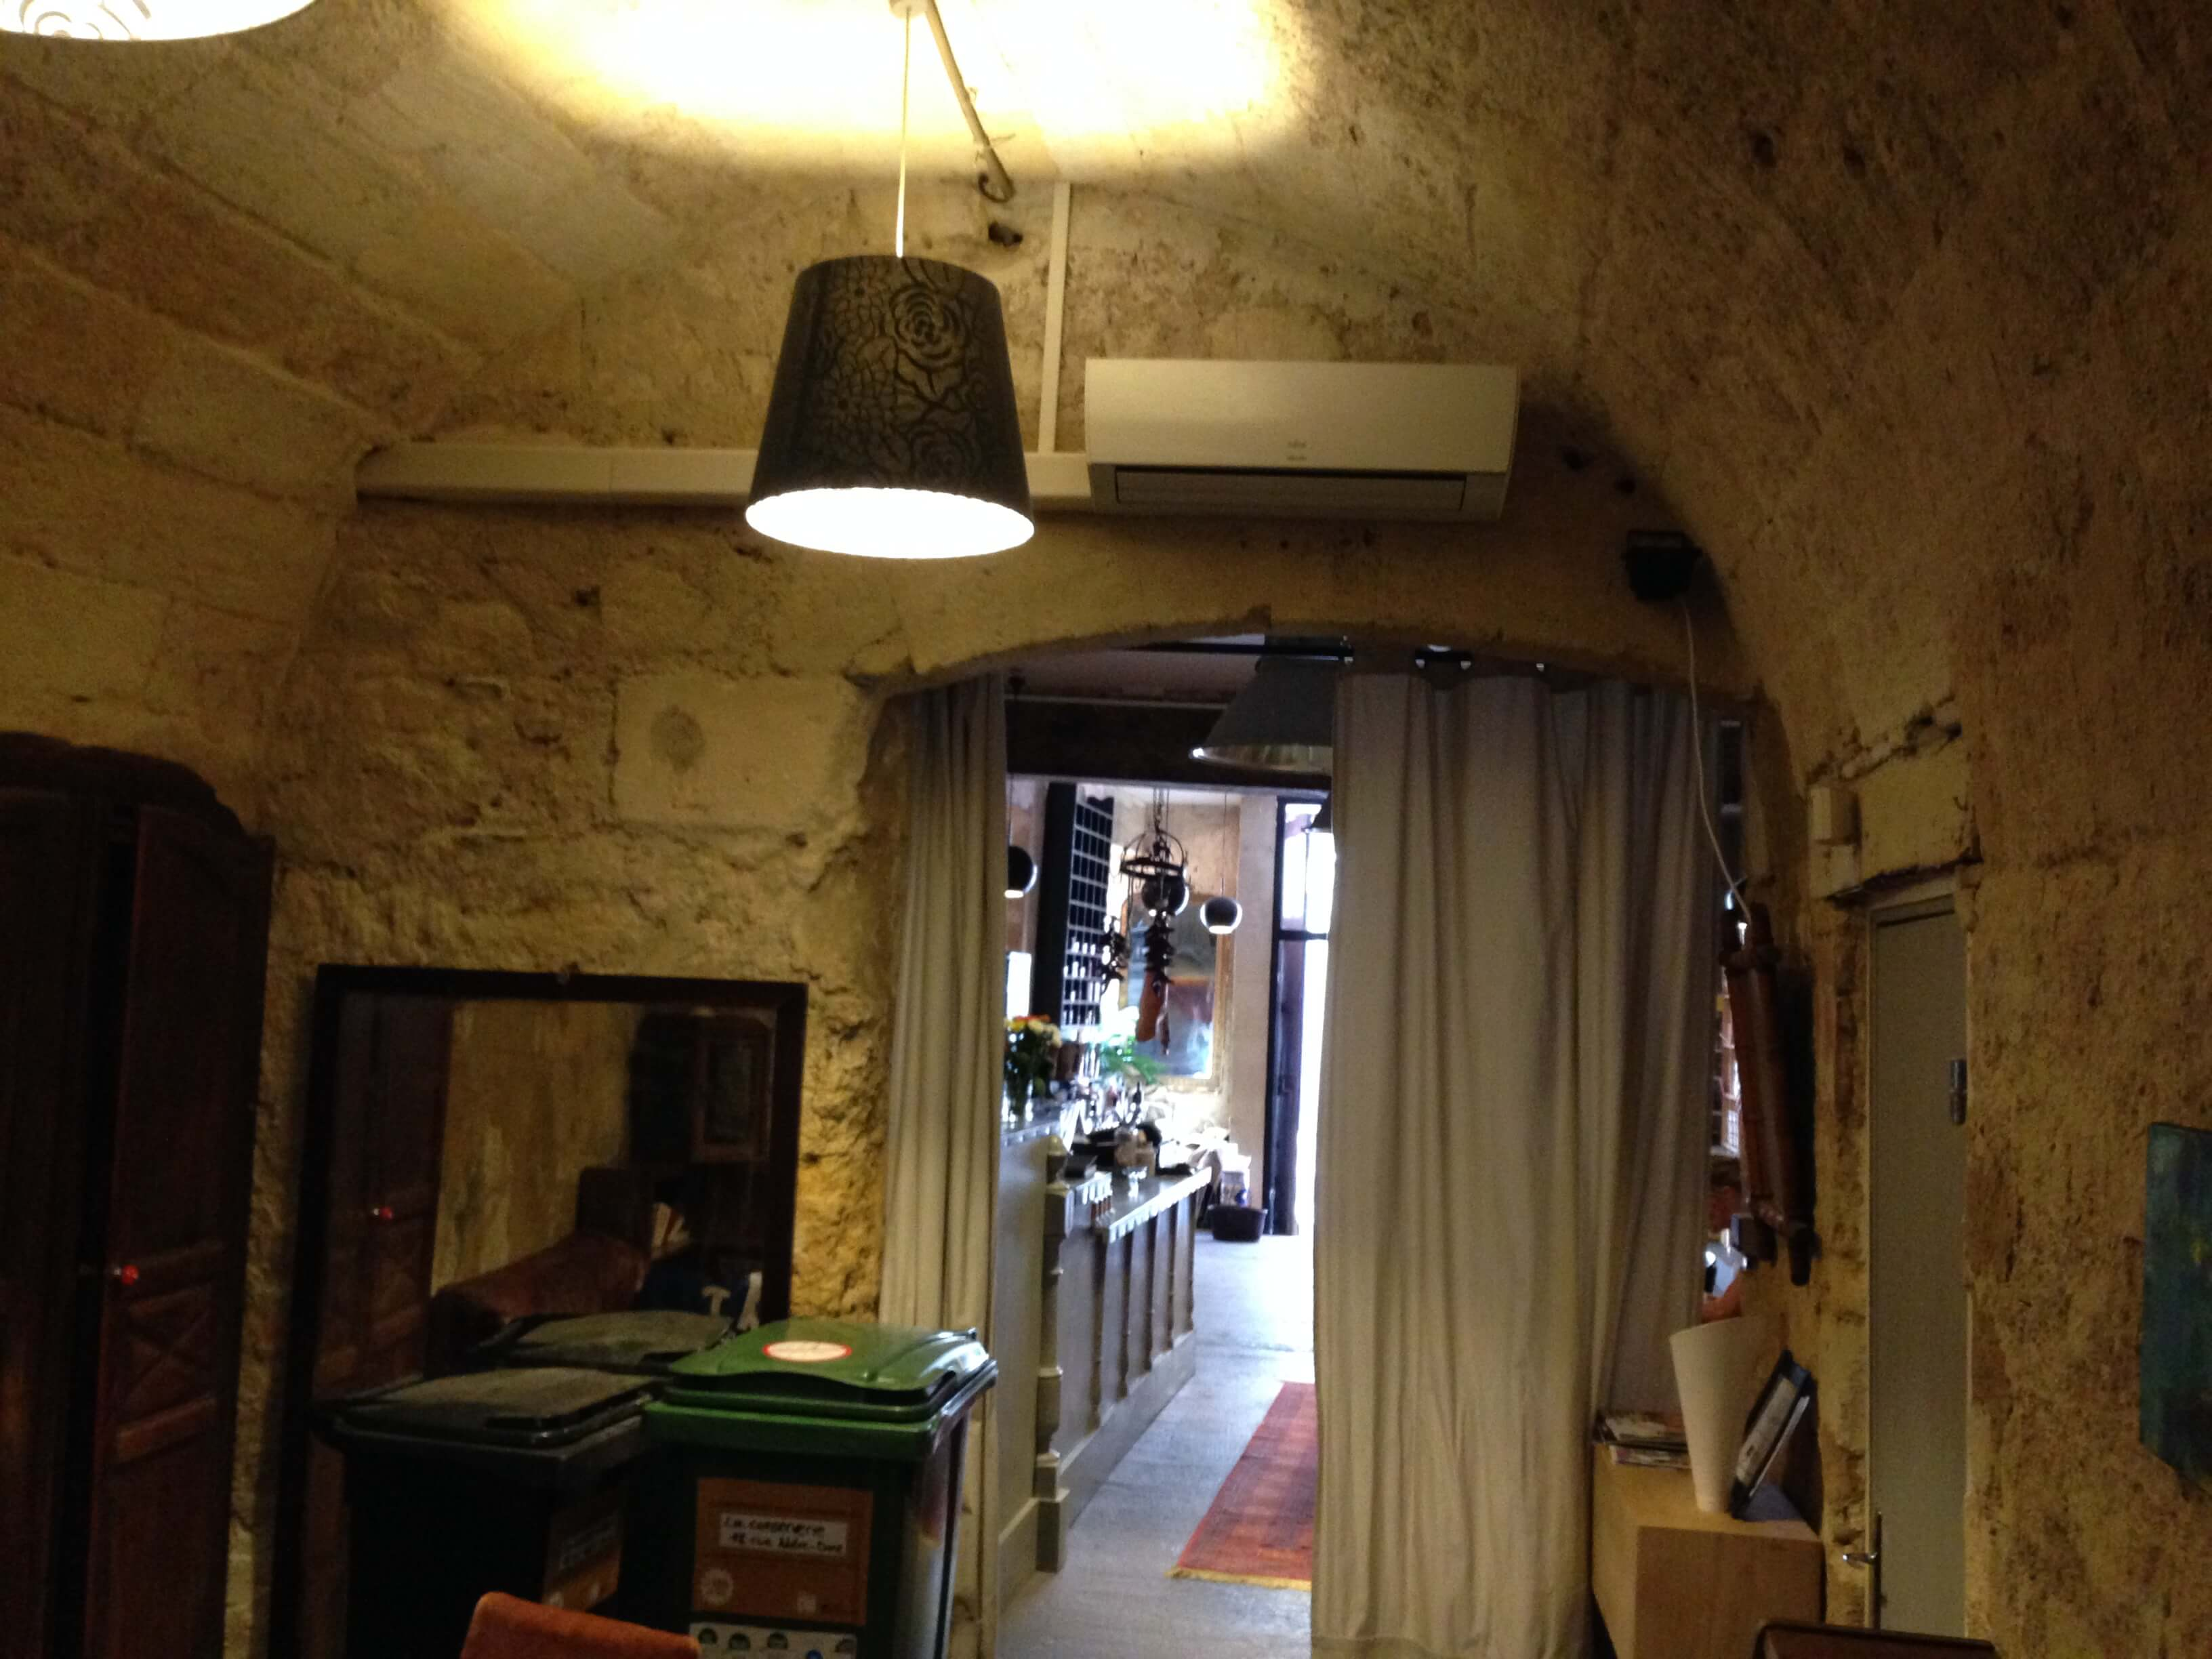 split climatisation atlantic restaurant bordeaux chartrons. Black Bedroom Furniture Sets. Home Design Ideas